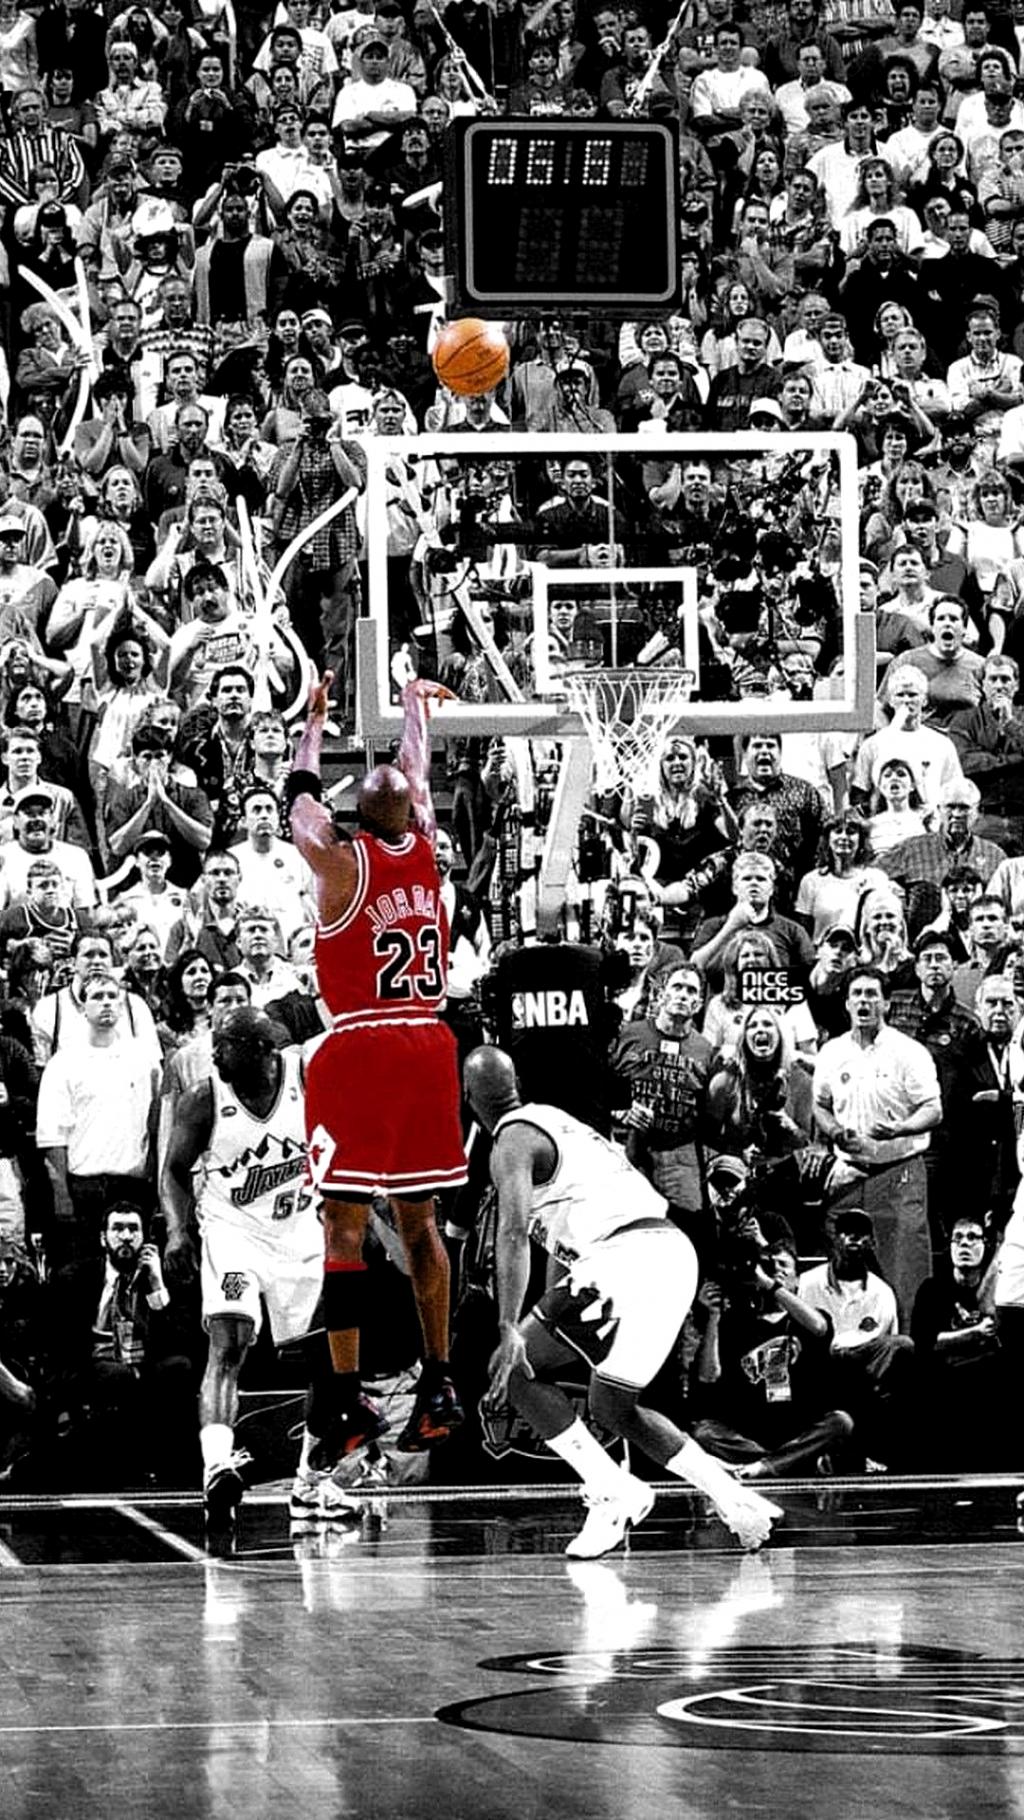 NBA iPhone 6 Wallpaper Best Wallpaper HD in 2020